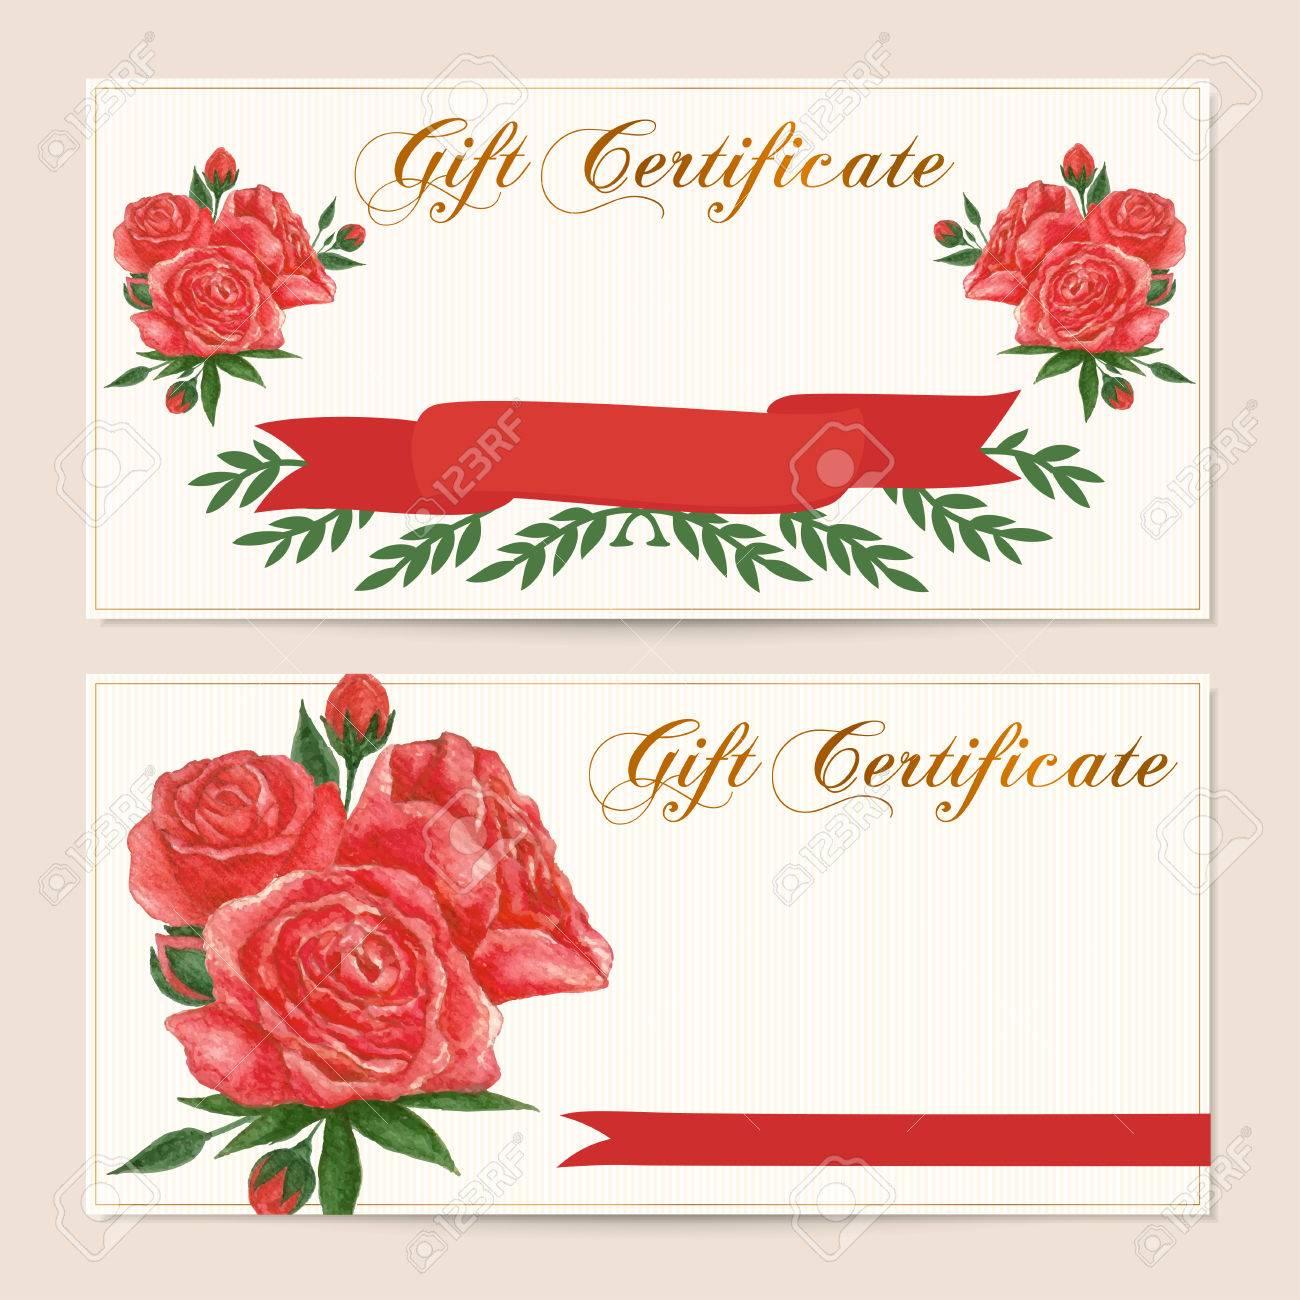 gift certificate voucher coupon reward gift card template